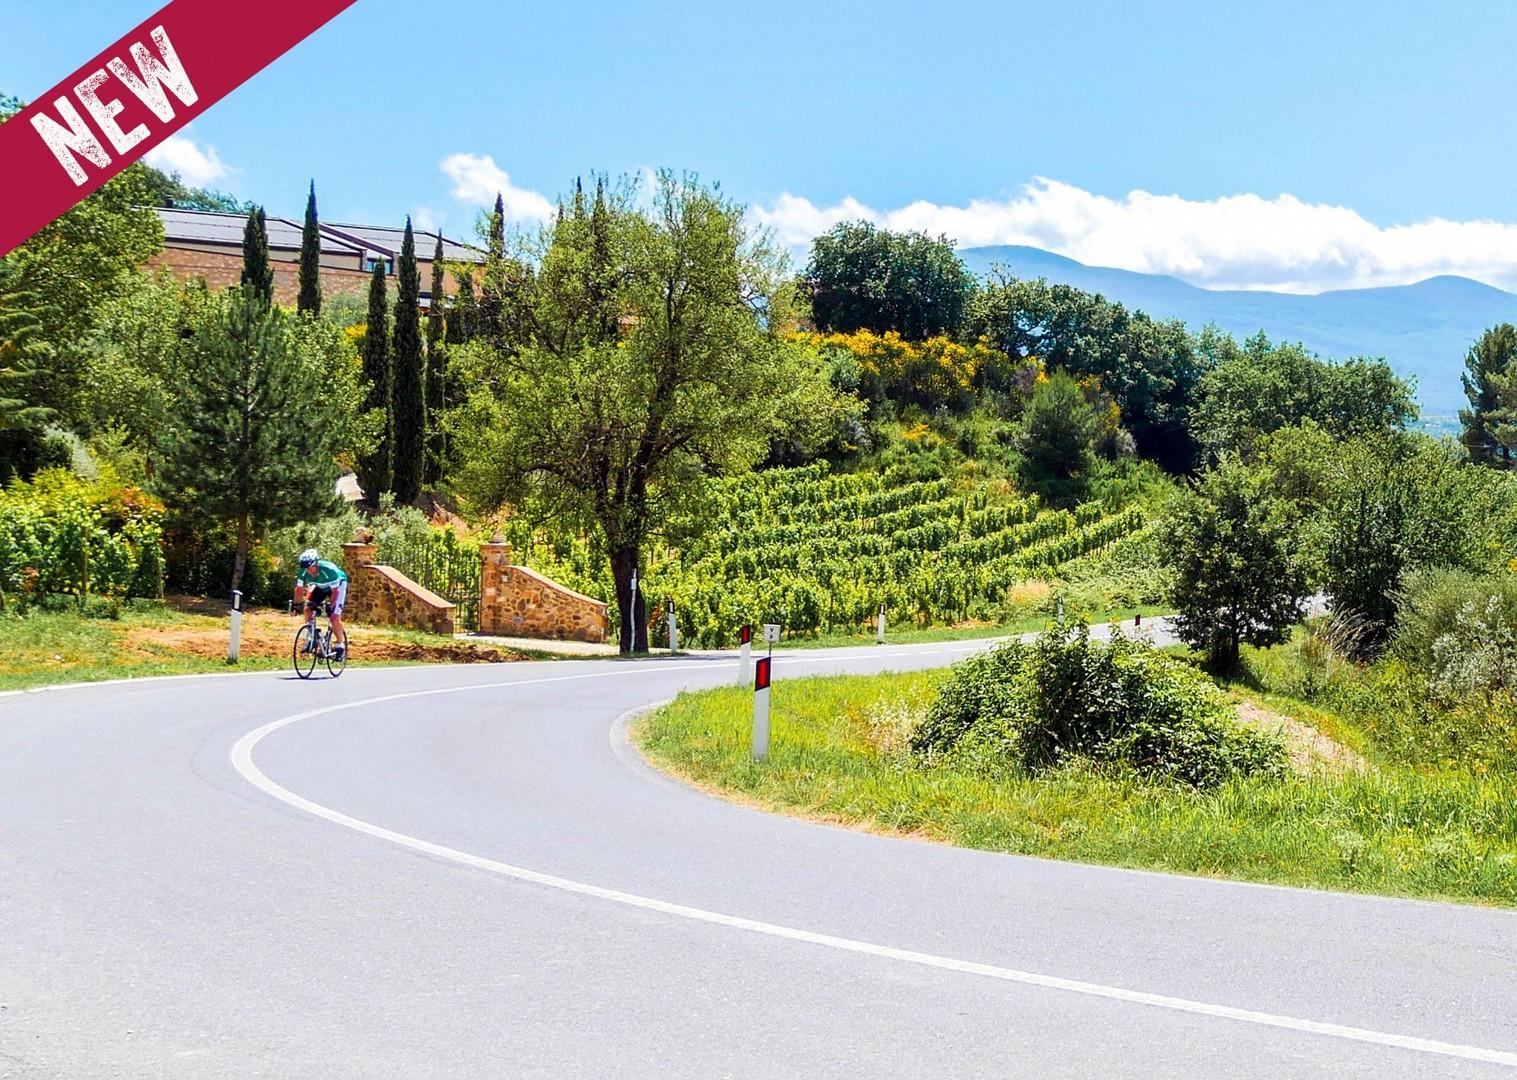 guided-road-cycling-holiday-saddle-skedaddle.jpg - NEW! Italy - Coast to Coast - L'Adriatico al Tirreno - Road Cycling